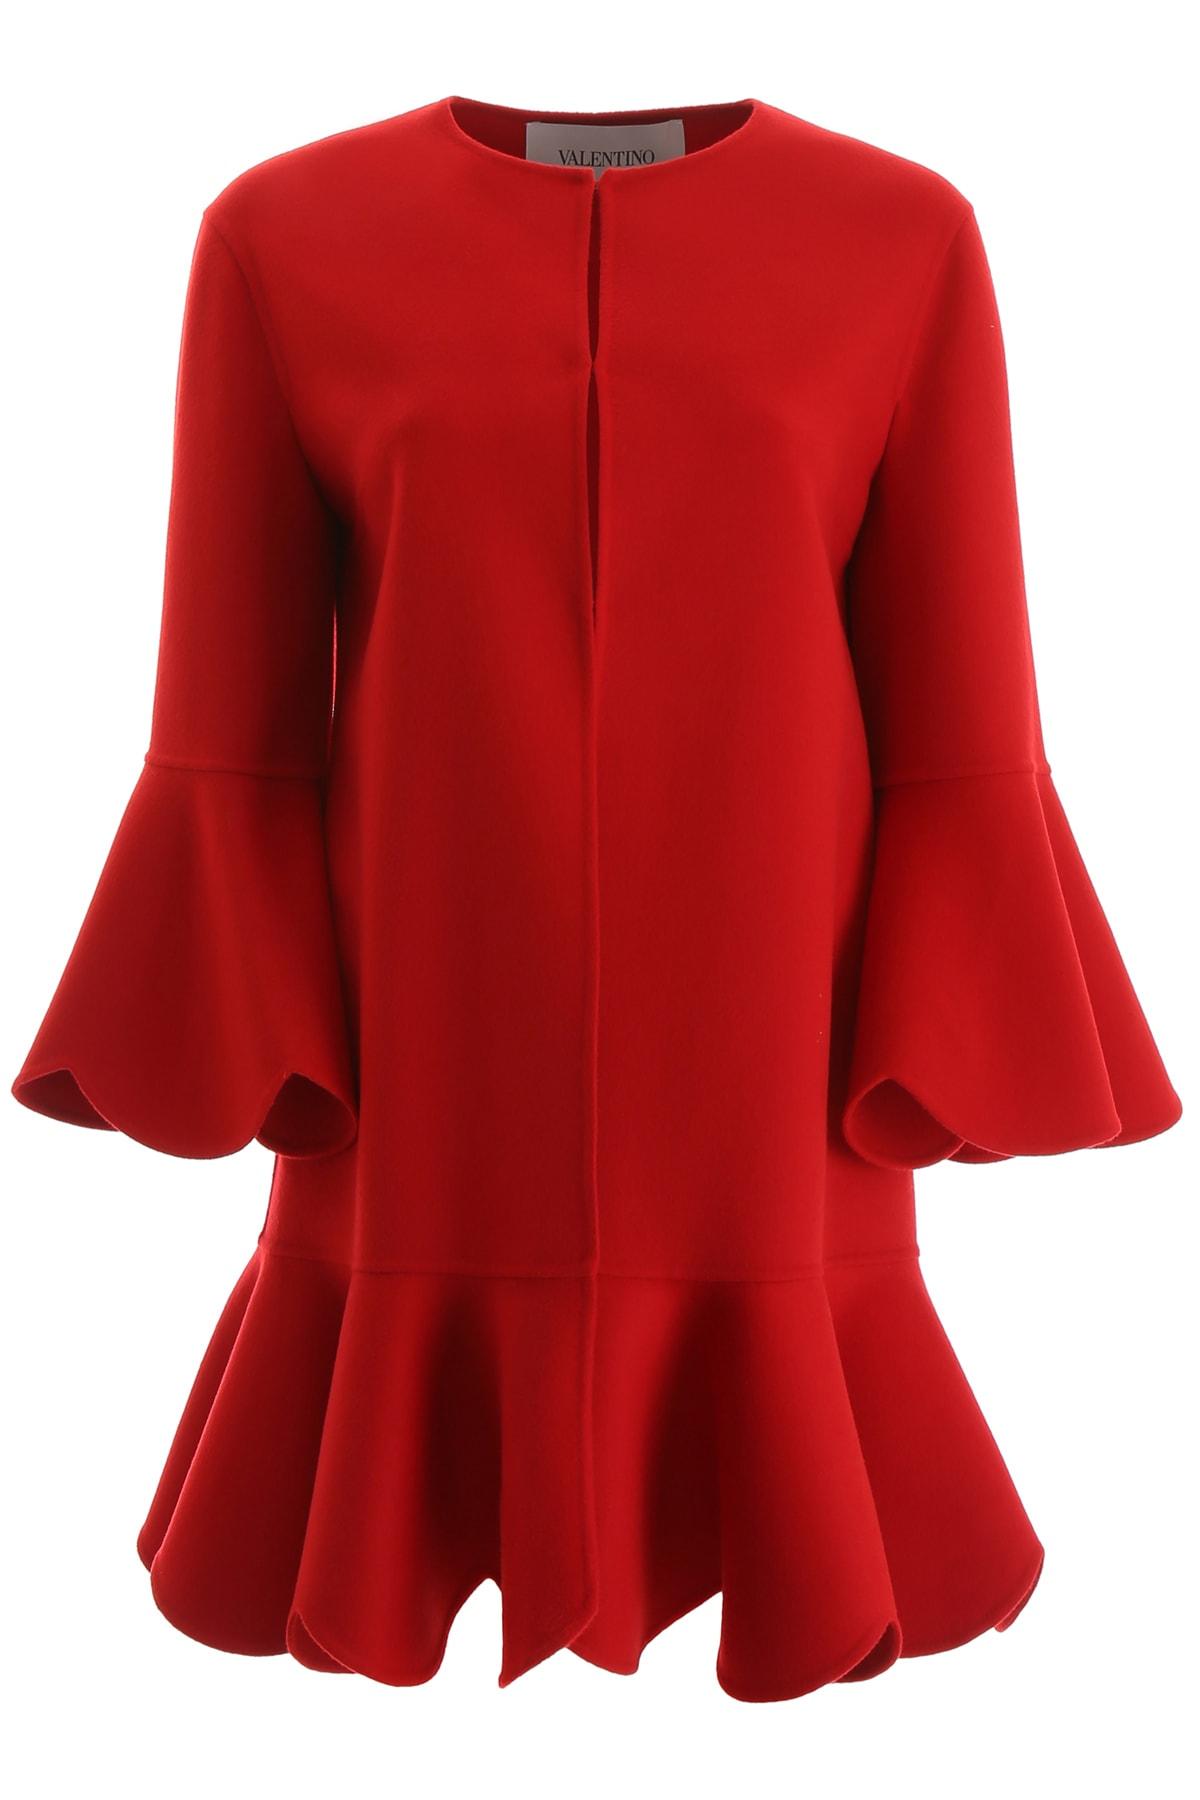 Photo of  Valentino Scallop Cape- shop Valentino jackets online sales